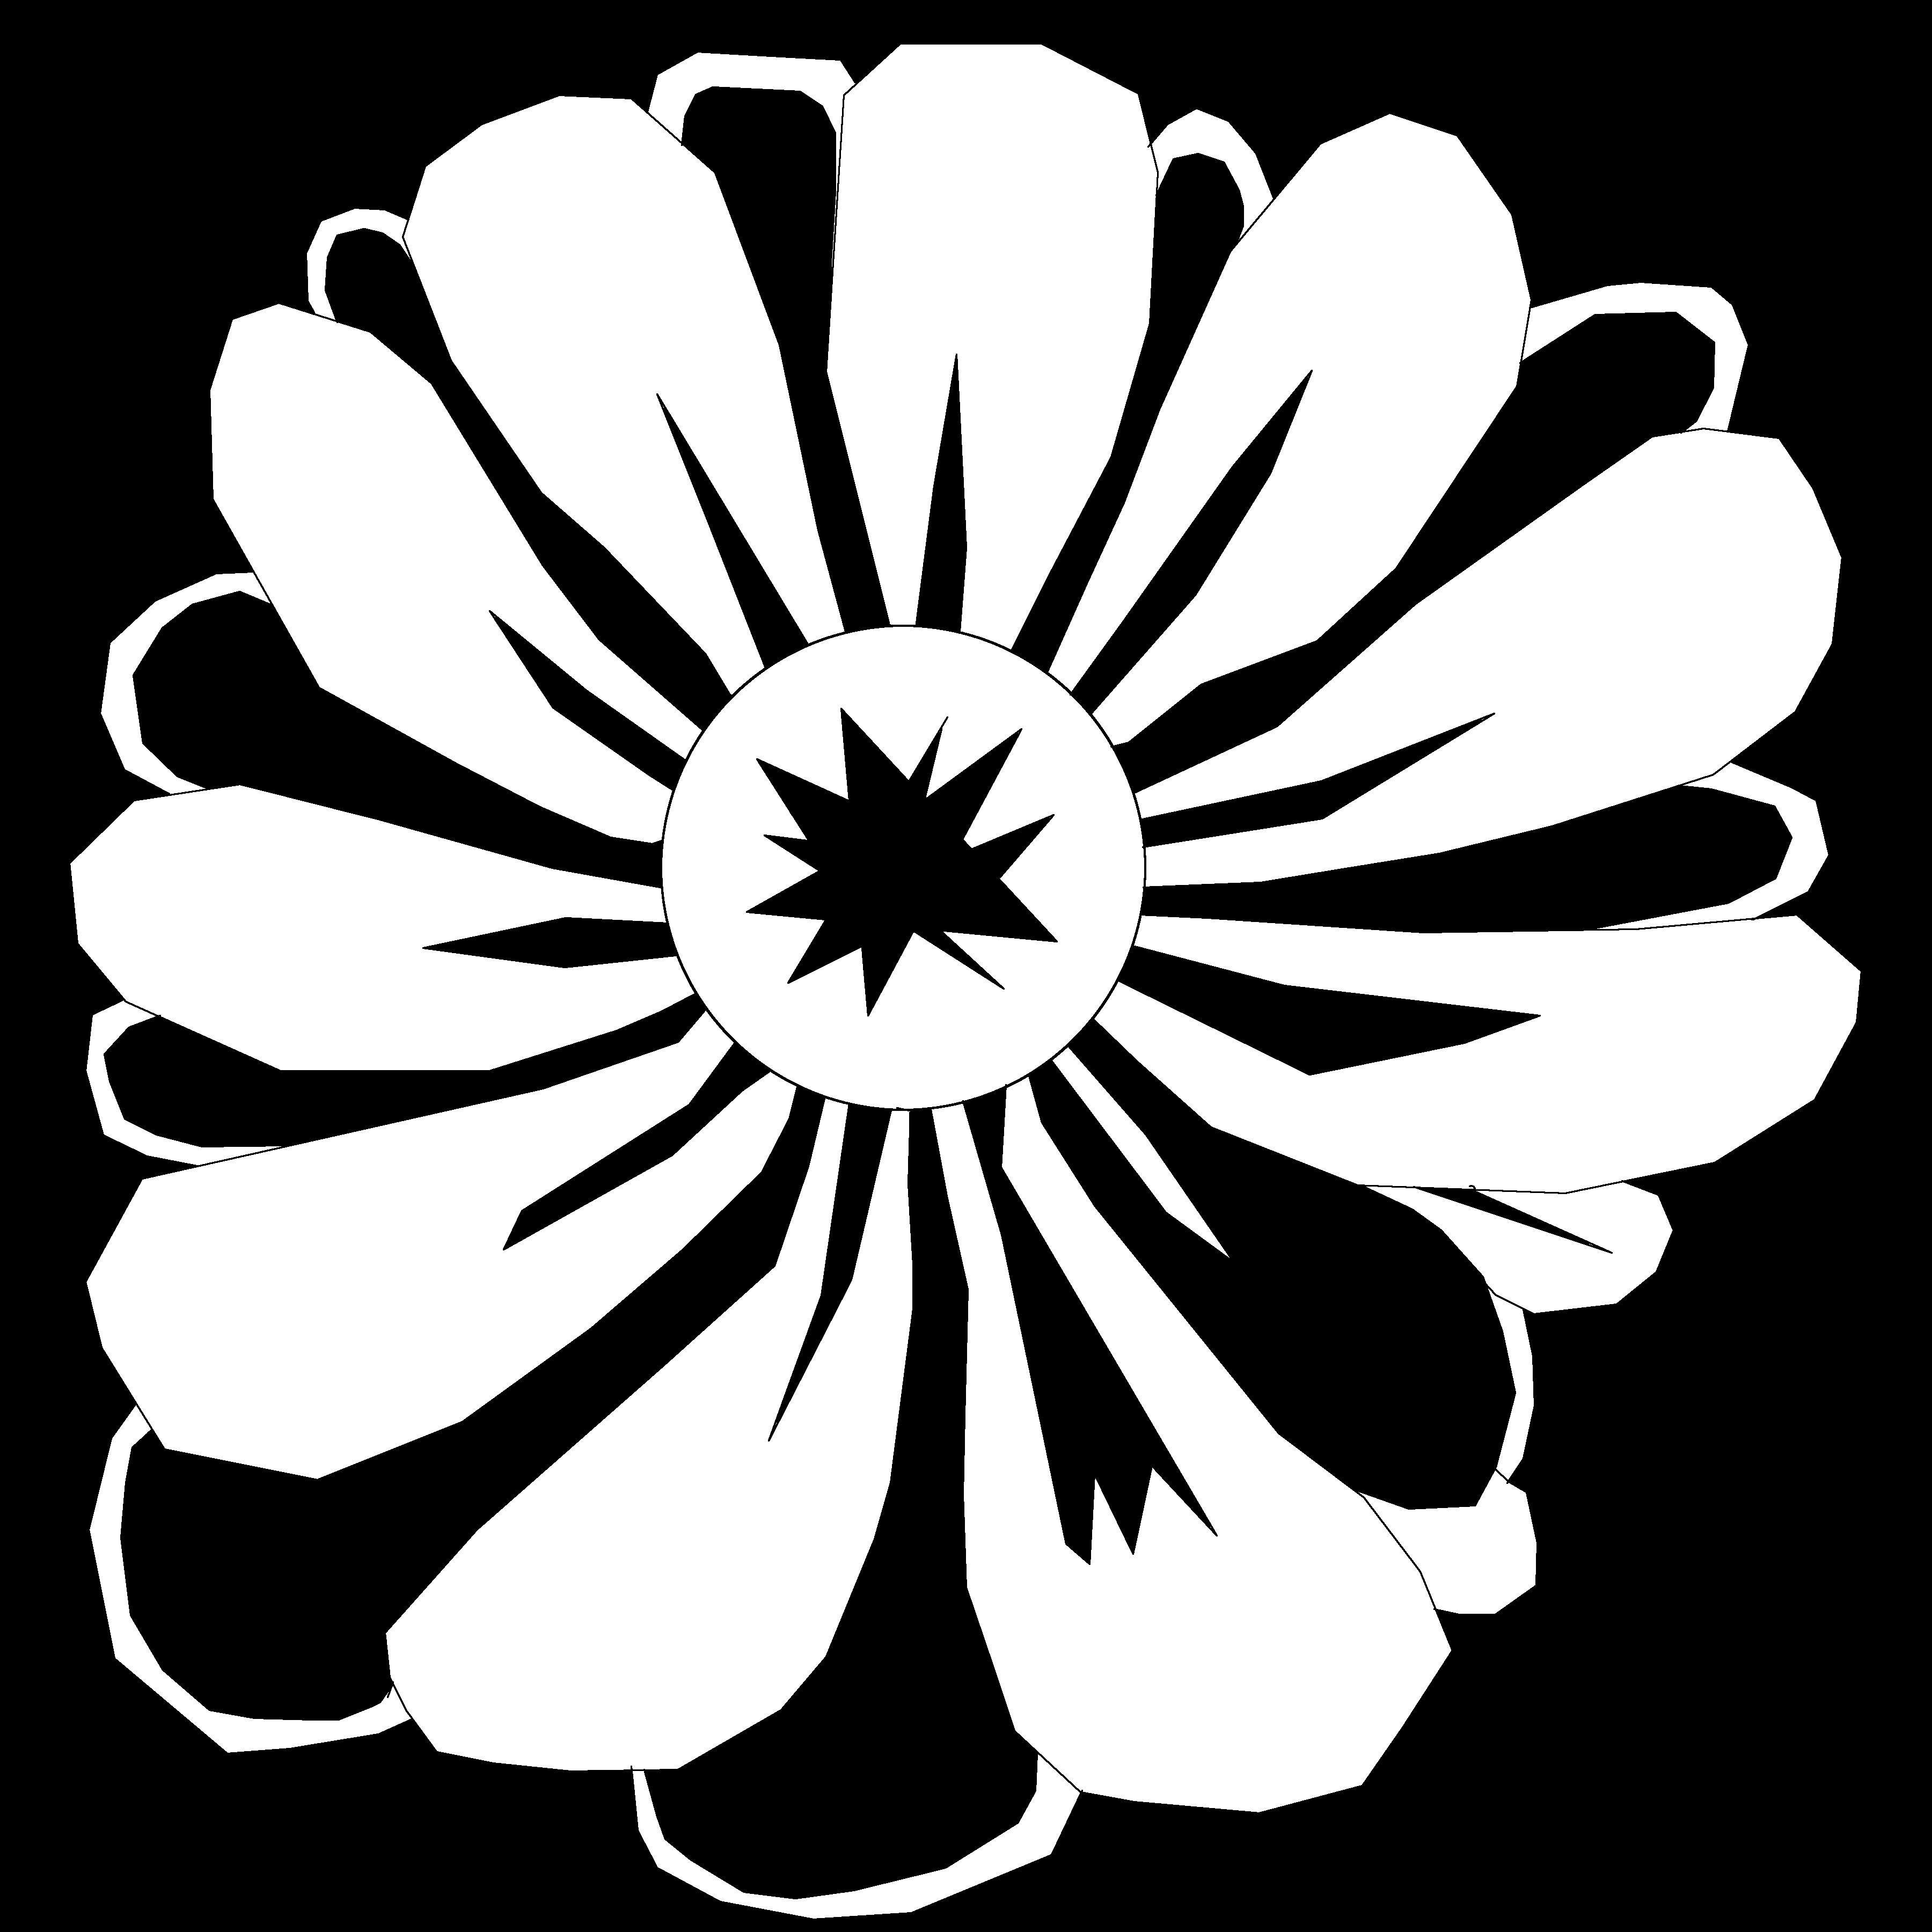 flower power illusion - photo #6